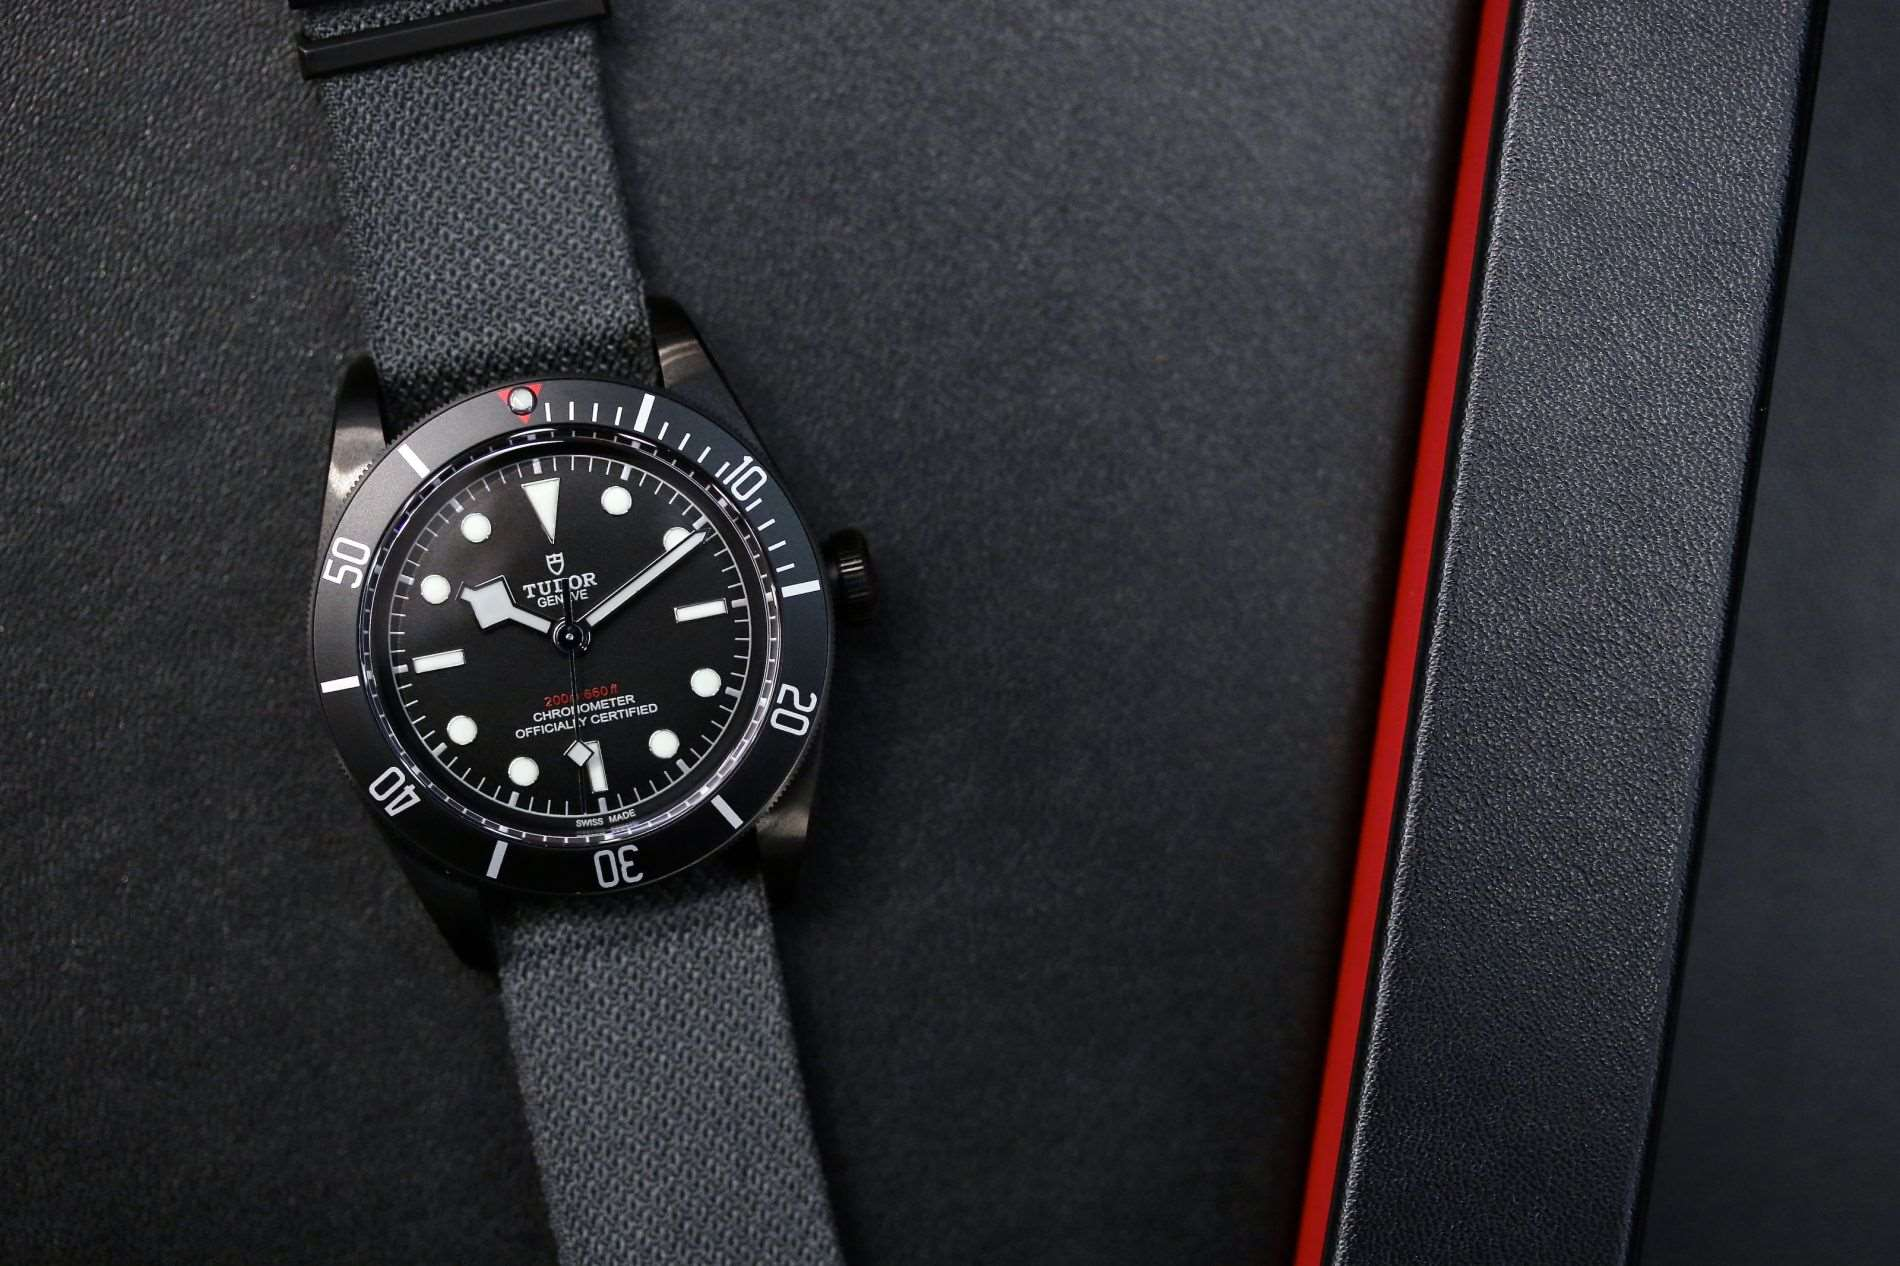 c84efc4e5b Τα μαύρα ρολόγια που θα χαρίσουν κύρος στην εμφάνισή σου